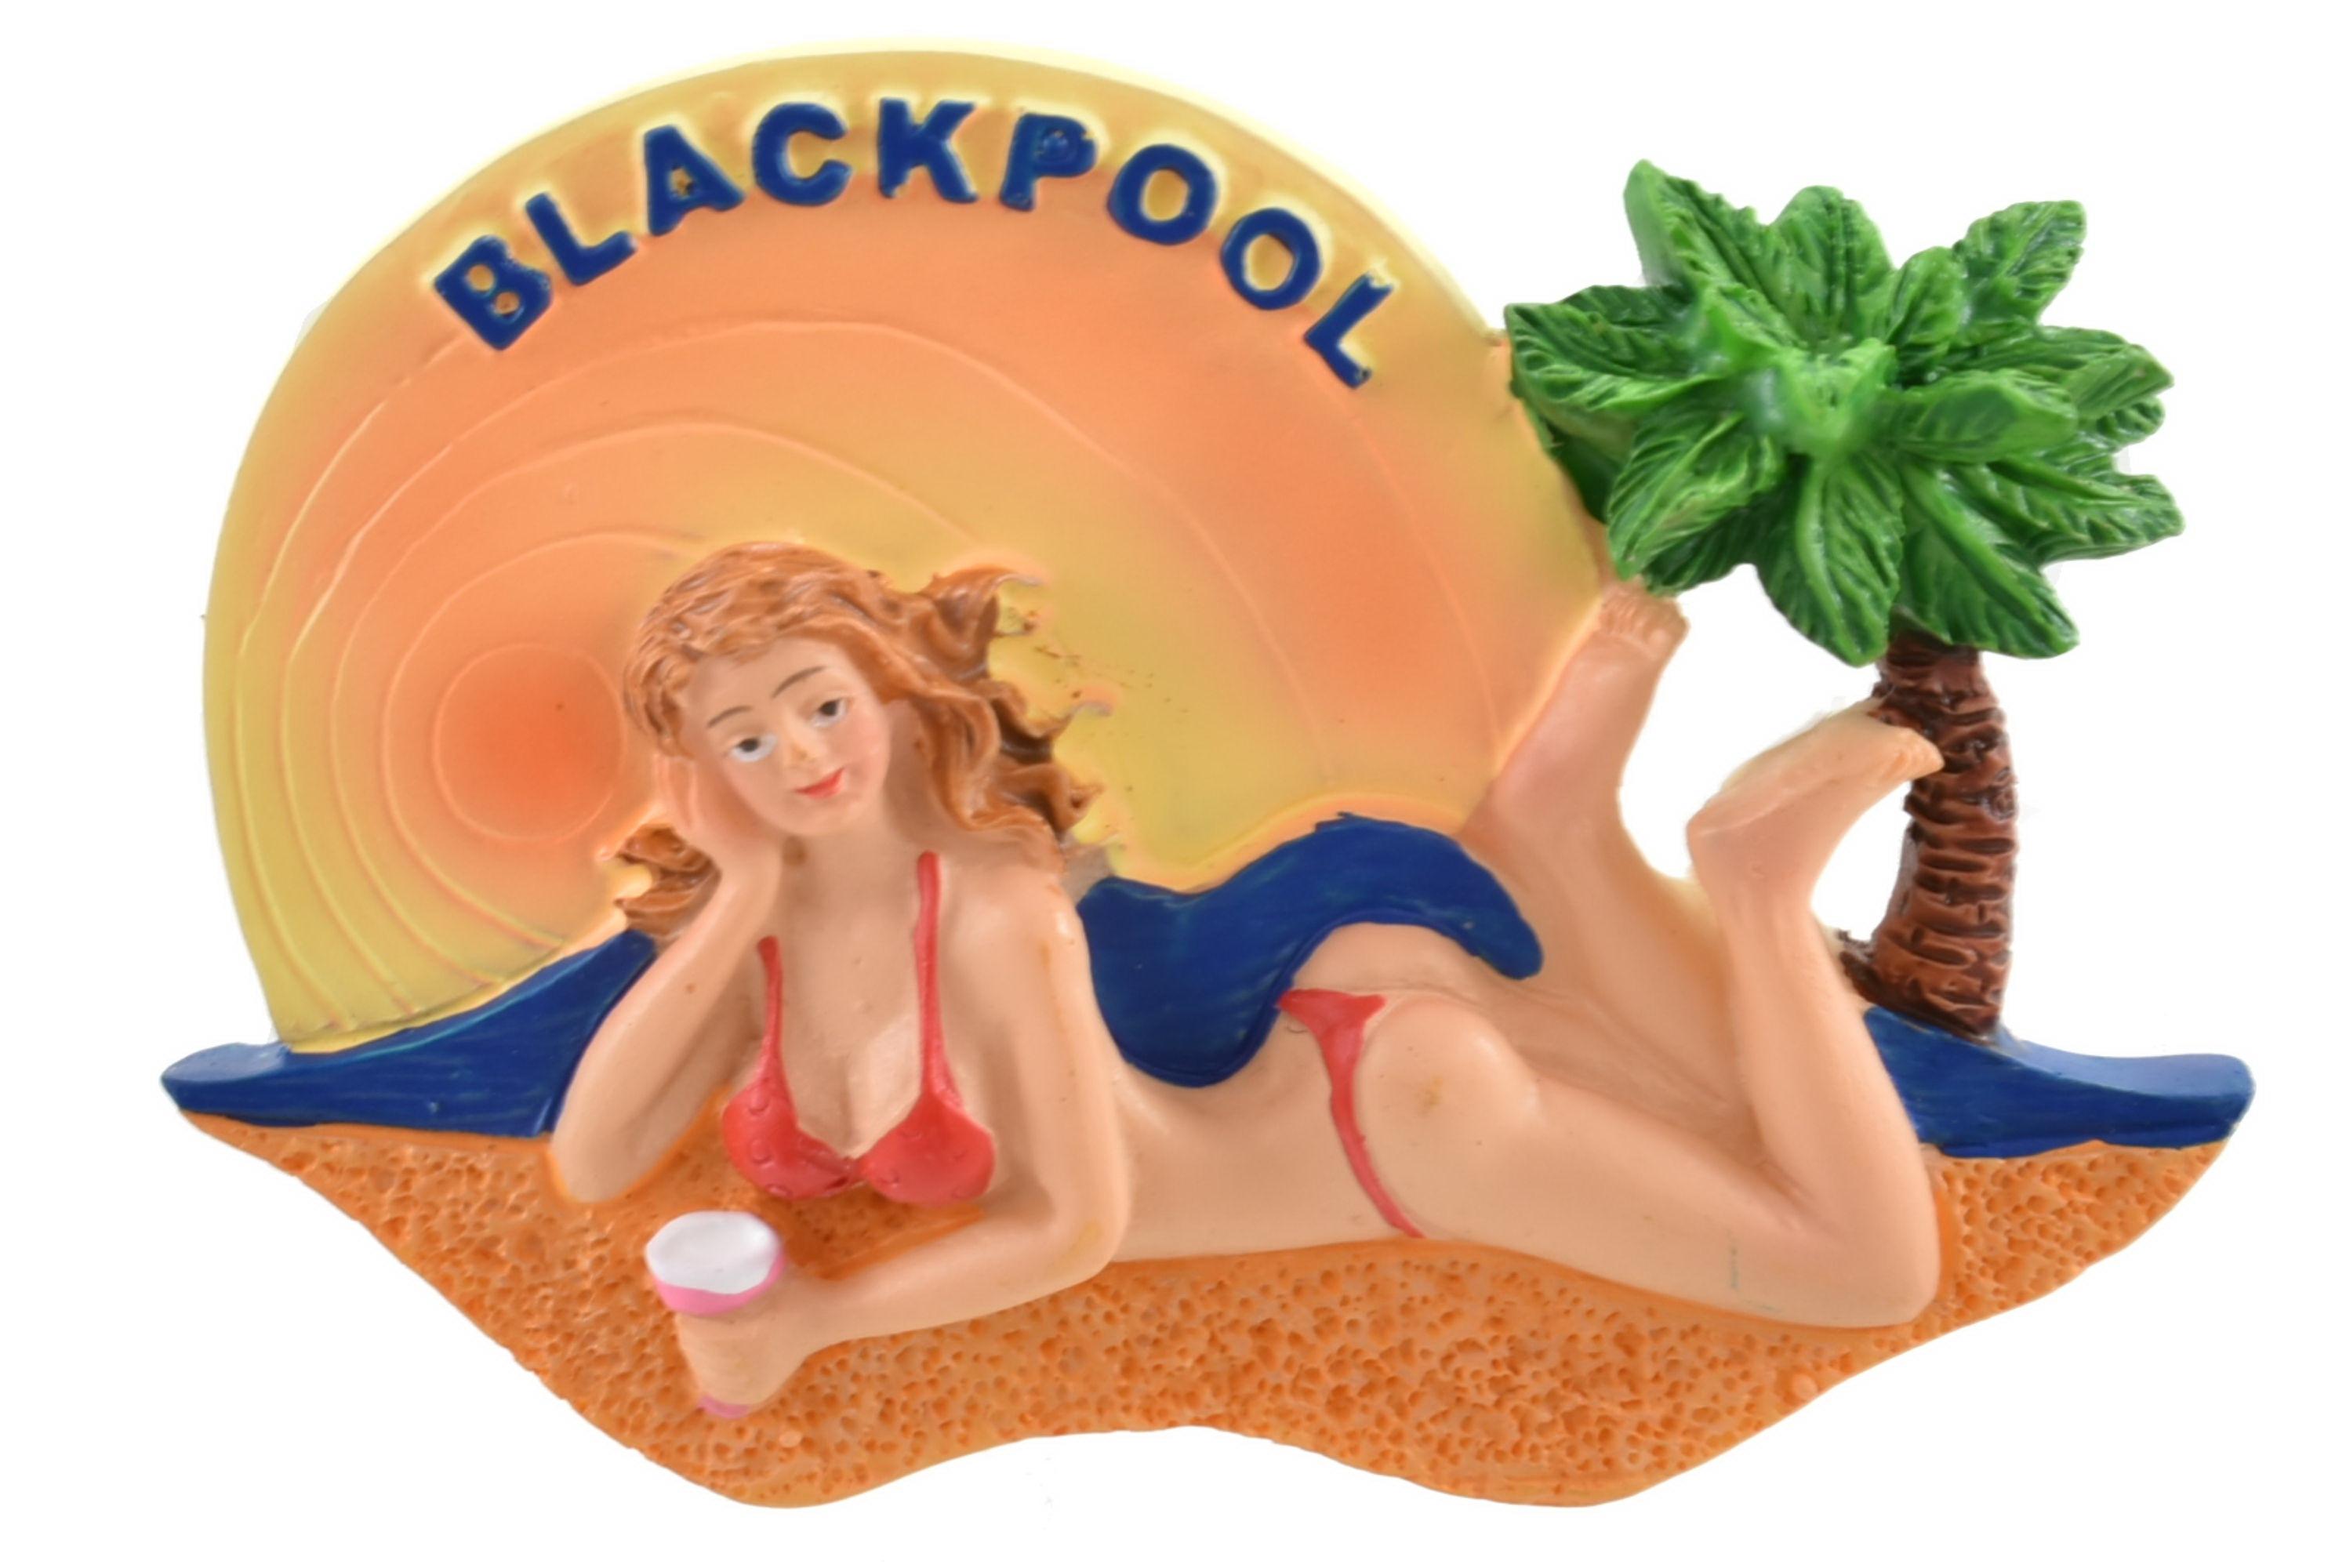 Blackpool Sunbathing Babe Resin Magnet